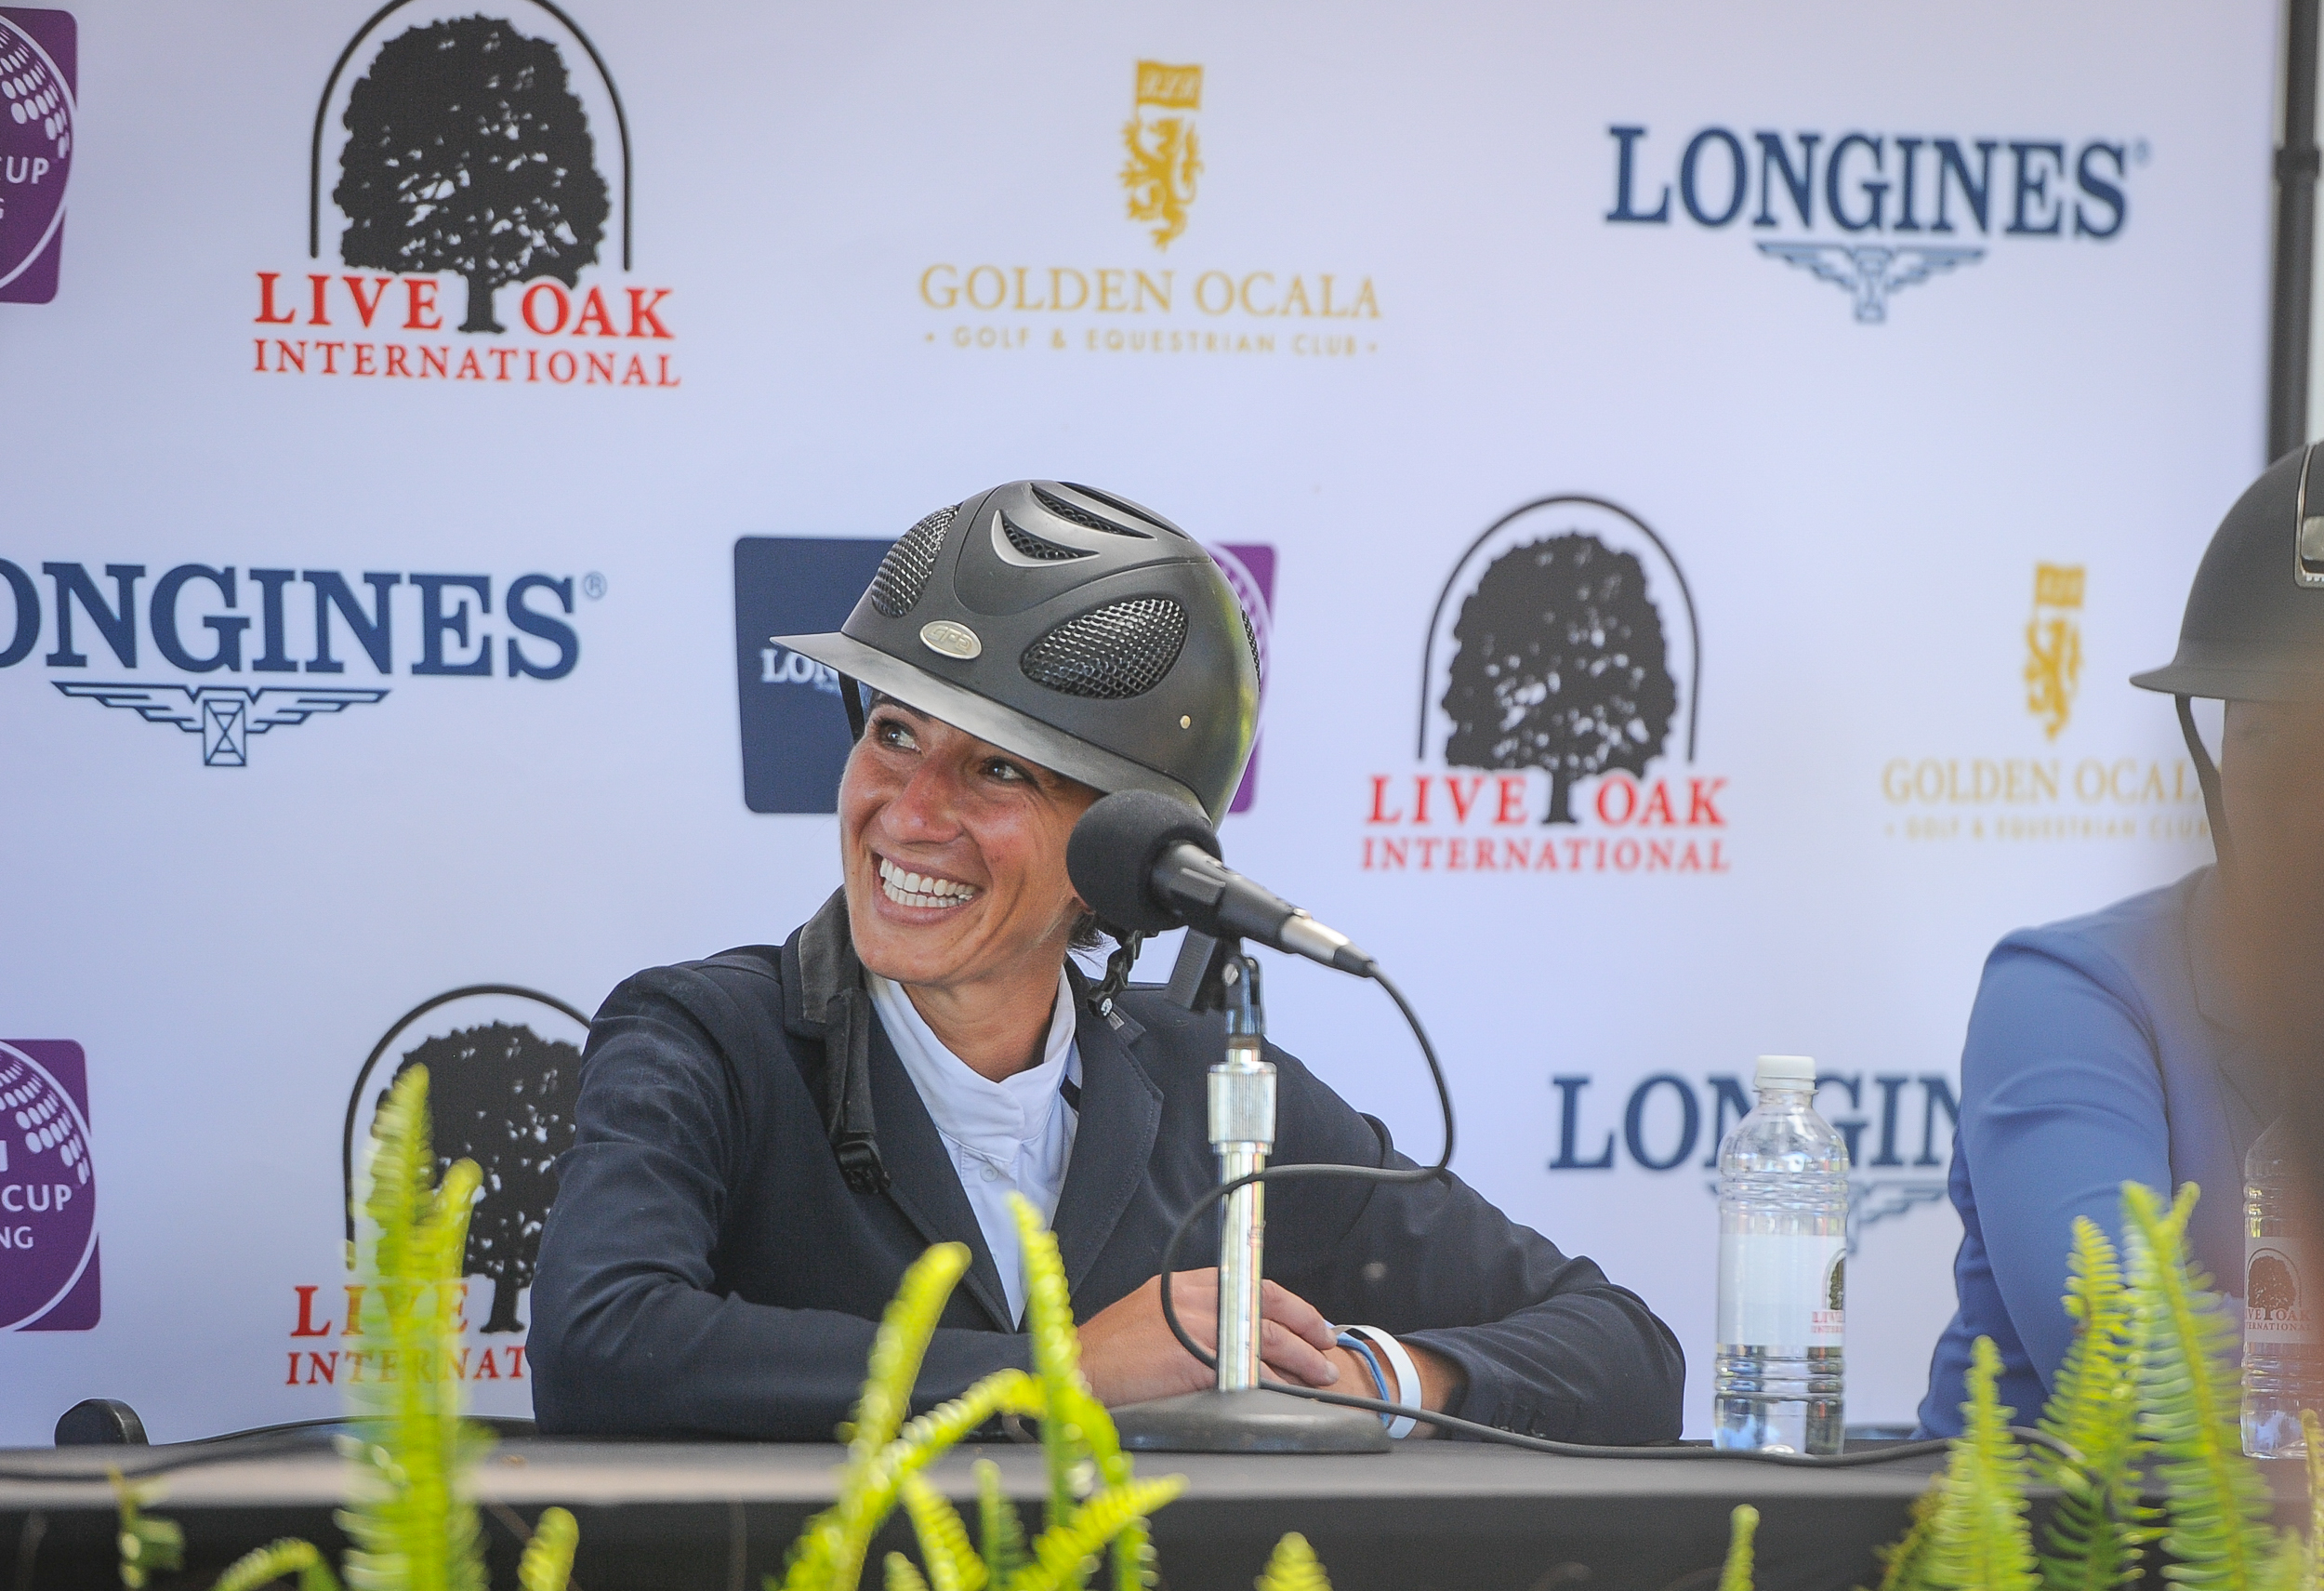 Tisbo Tops $35,000 CSI3* Longines FEI World Ranking Class at Live Oak International